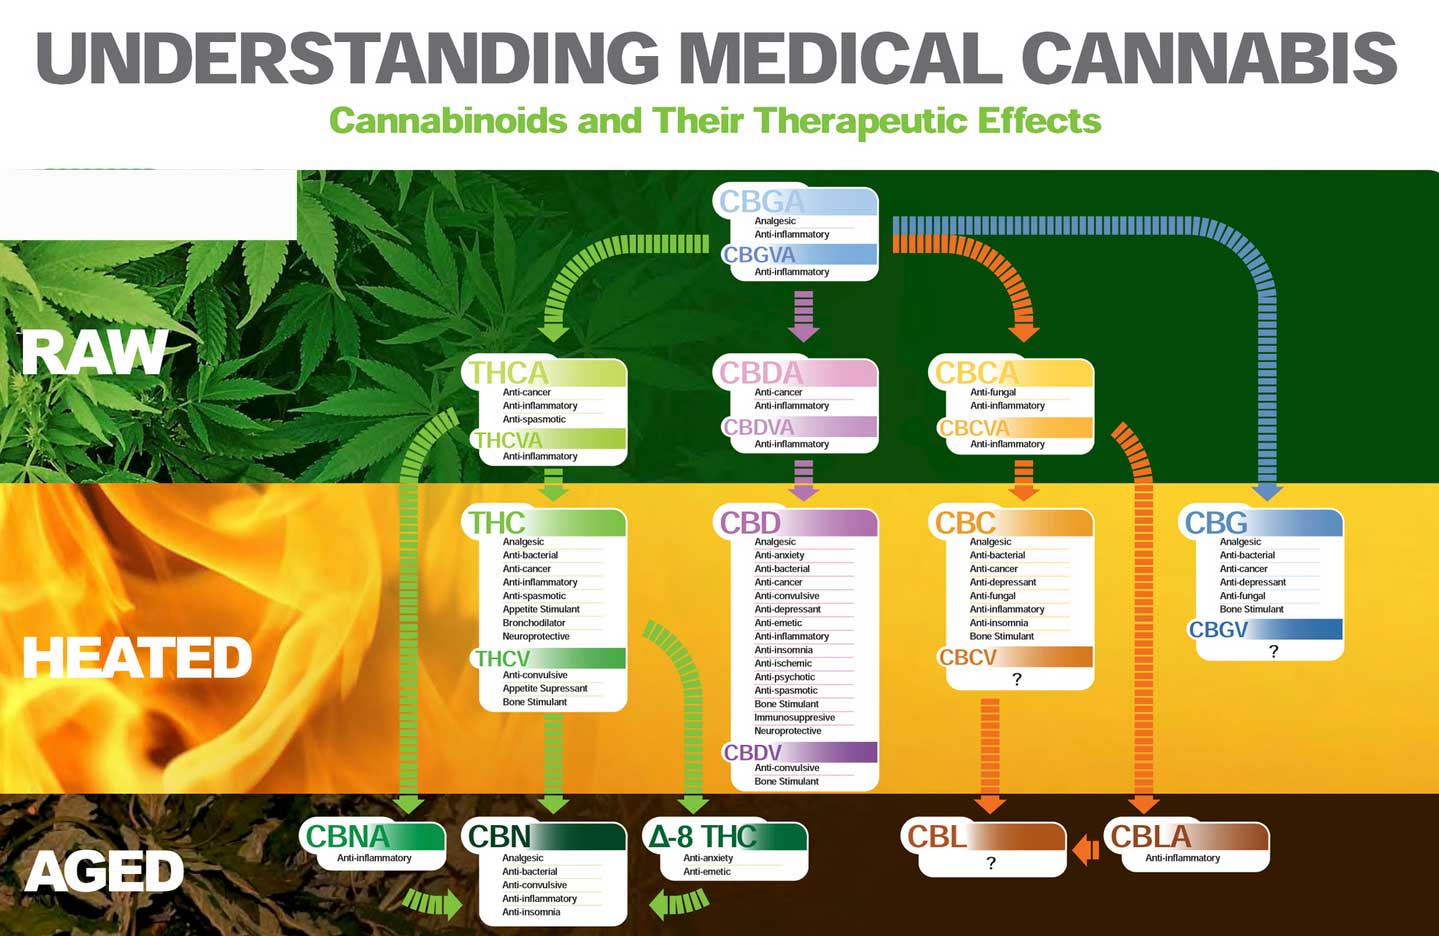 Cannabinoide Medikament